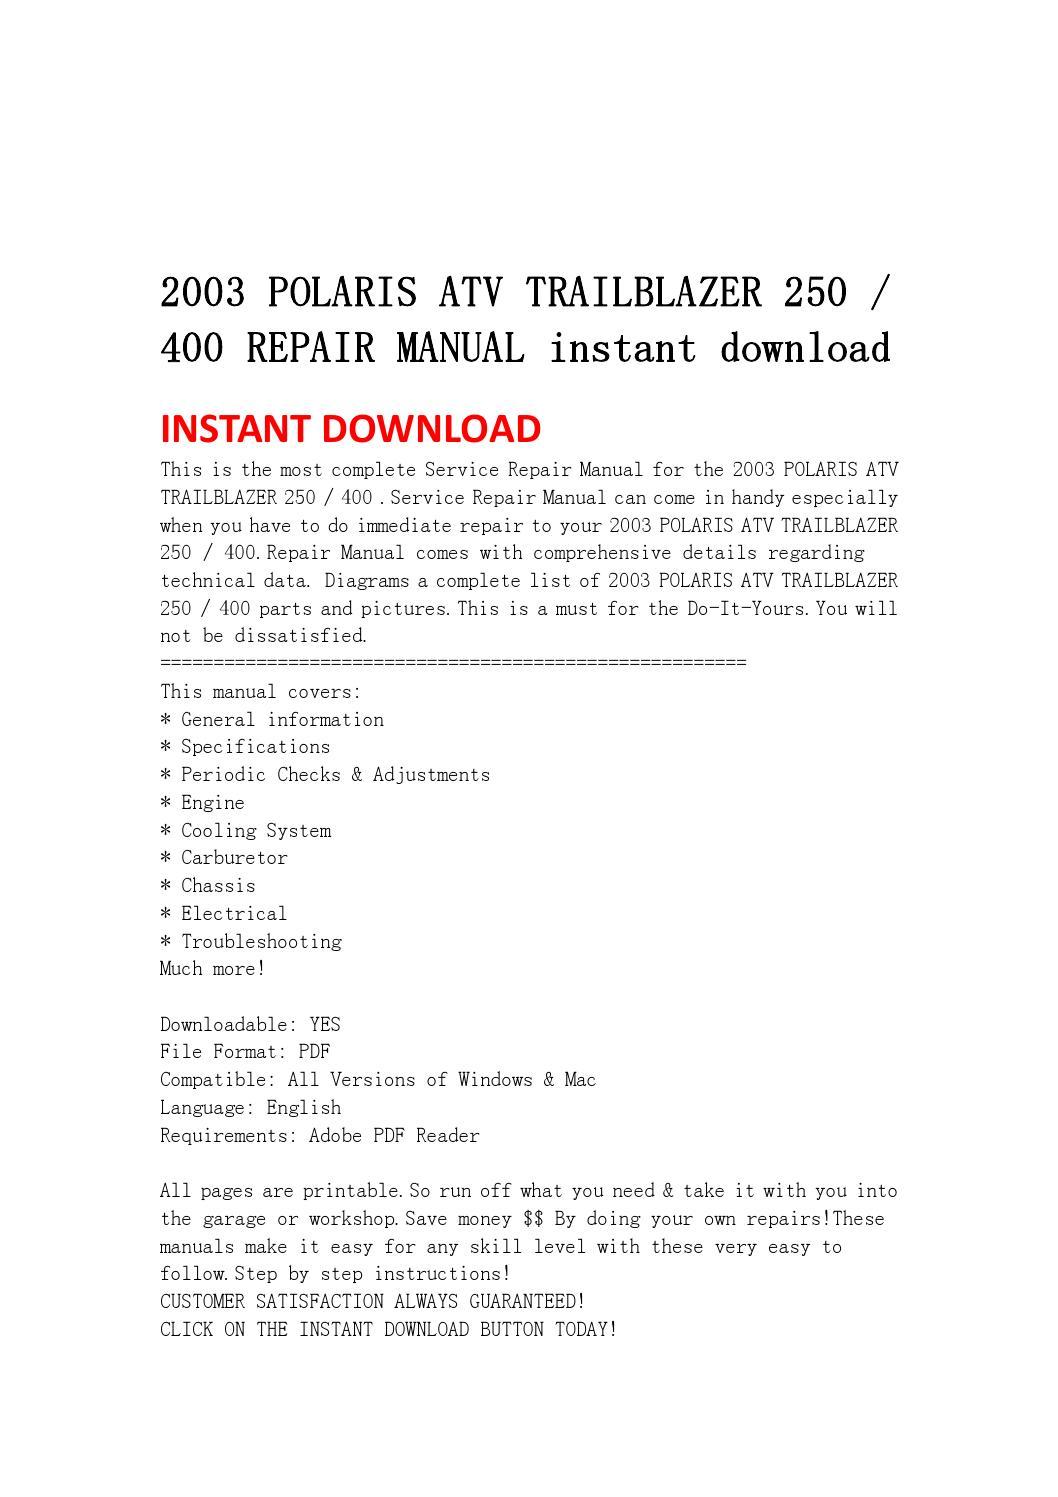 polaris trailblazer 250 service manual pdf